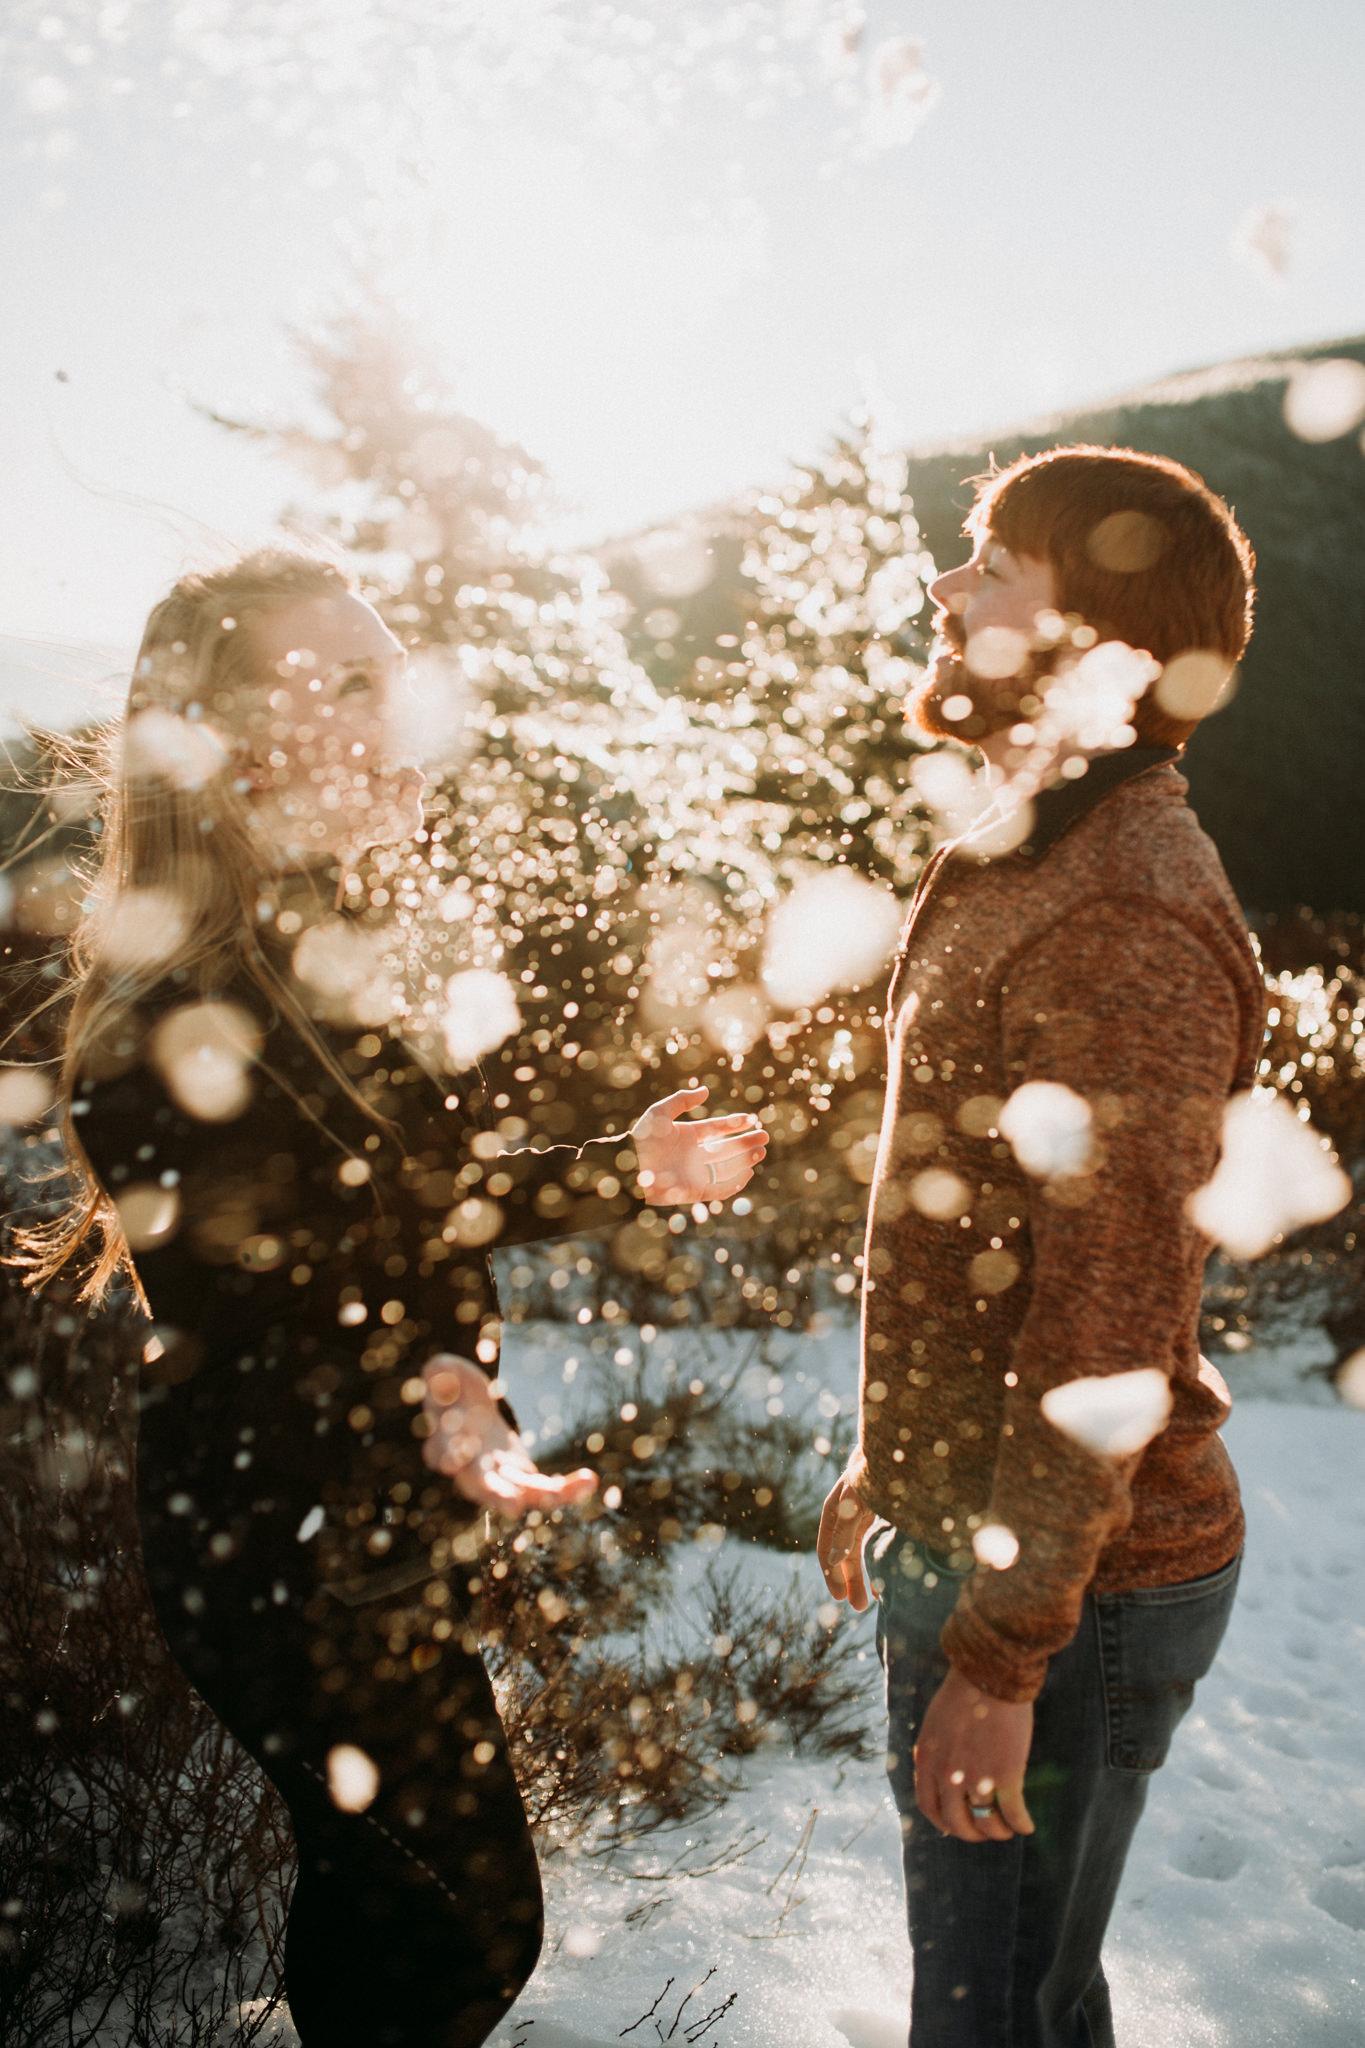 MonicaLeavellPhoto-AshleyMitch-NorthCarolina-Adventure-Engagement-Photographer-29.jpg